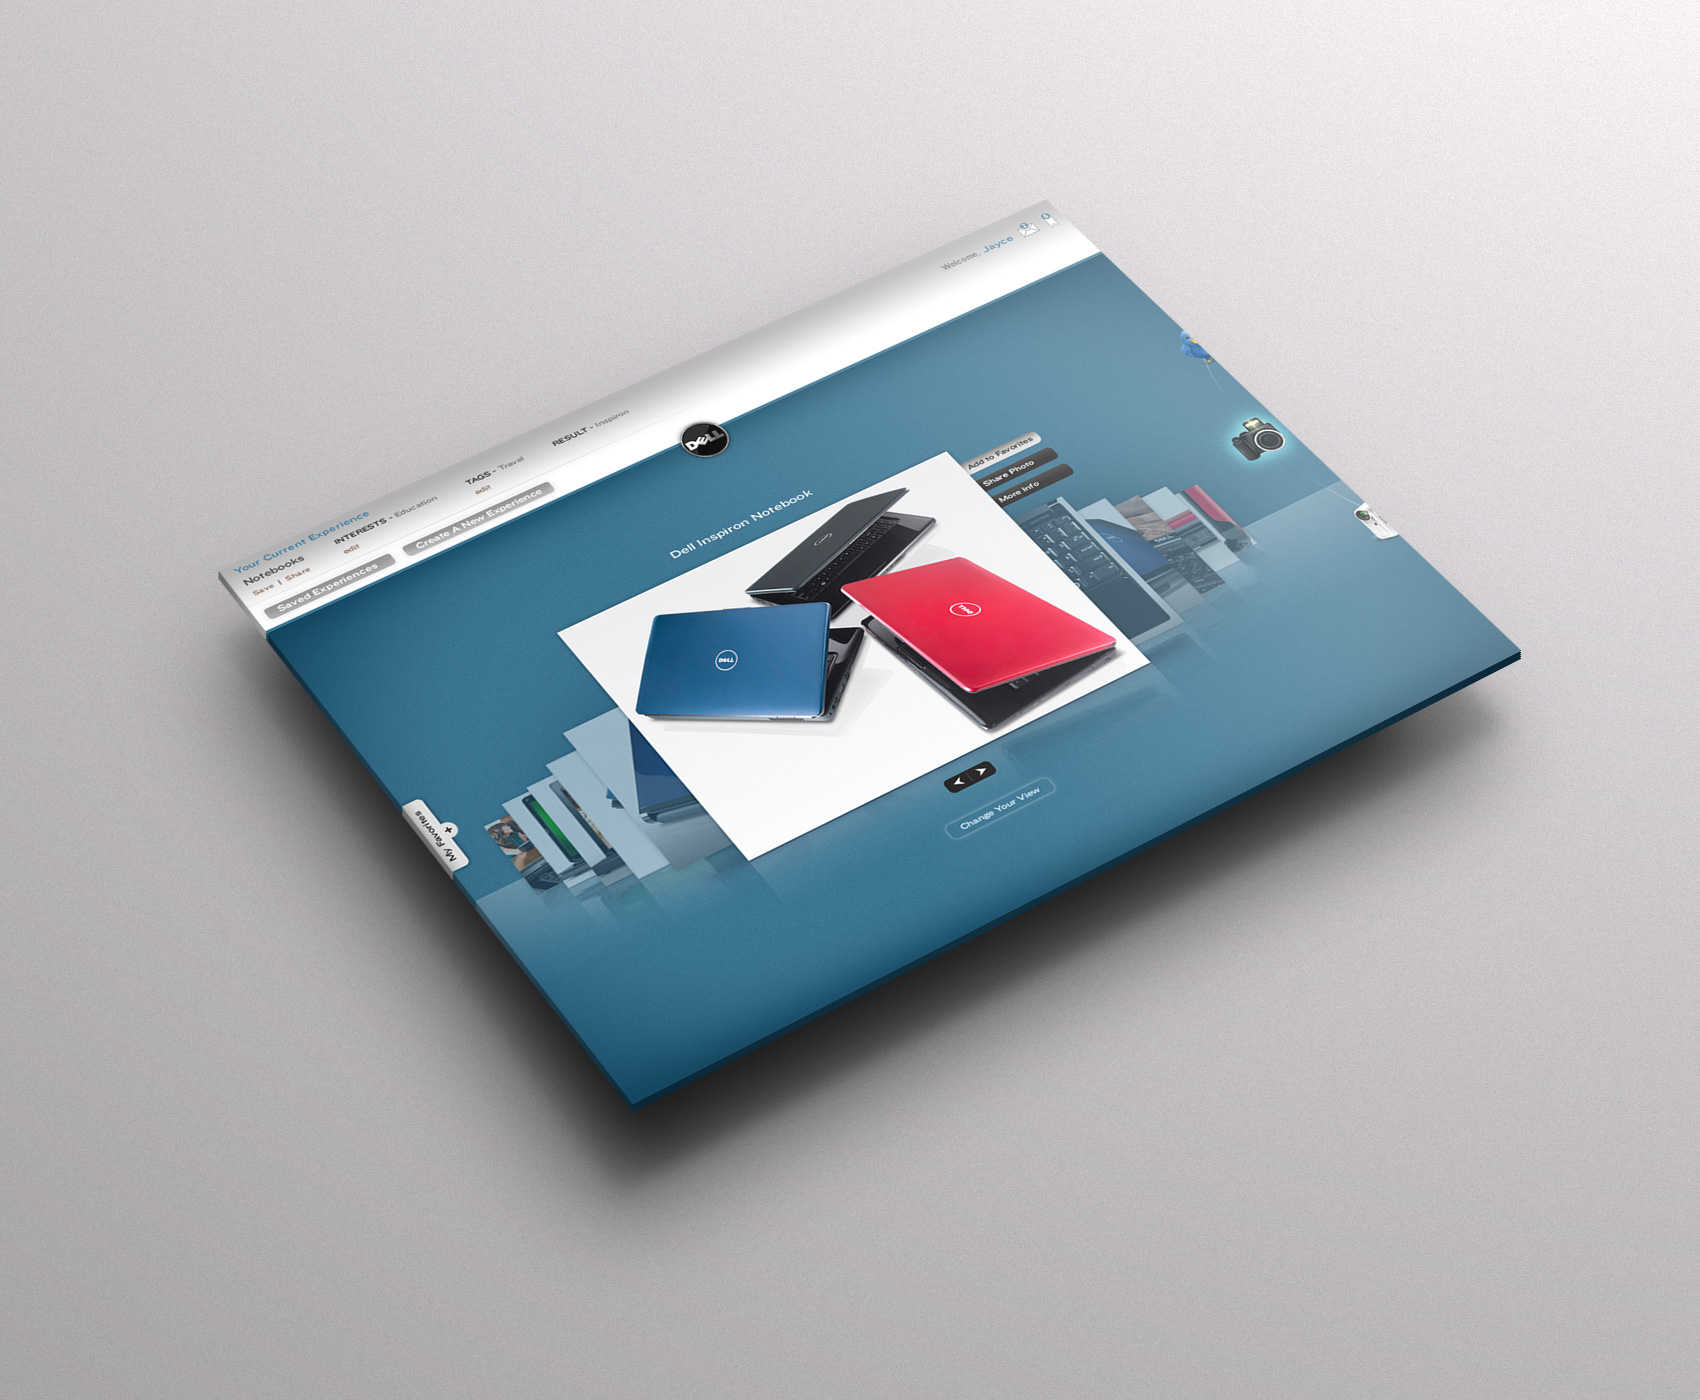 DellExperience-4.jpg